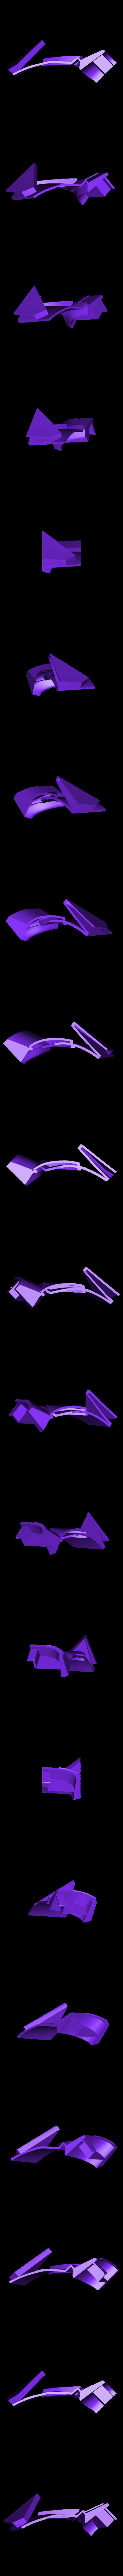 Part 9 v1.stl Download STL file ARF Trooper Helmet • 3D print object, VillainousPropShop